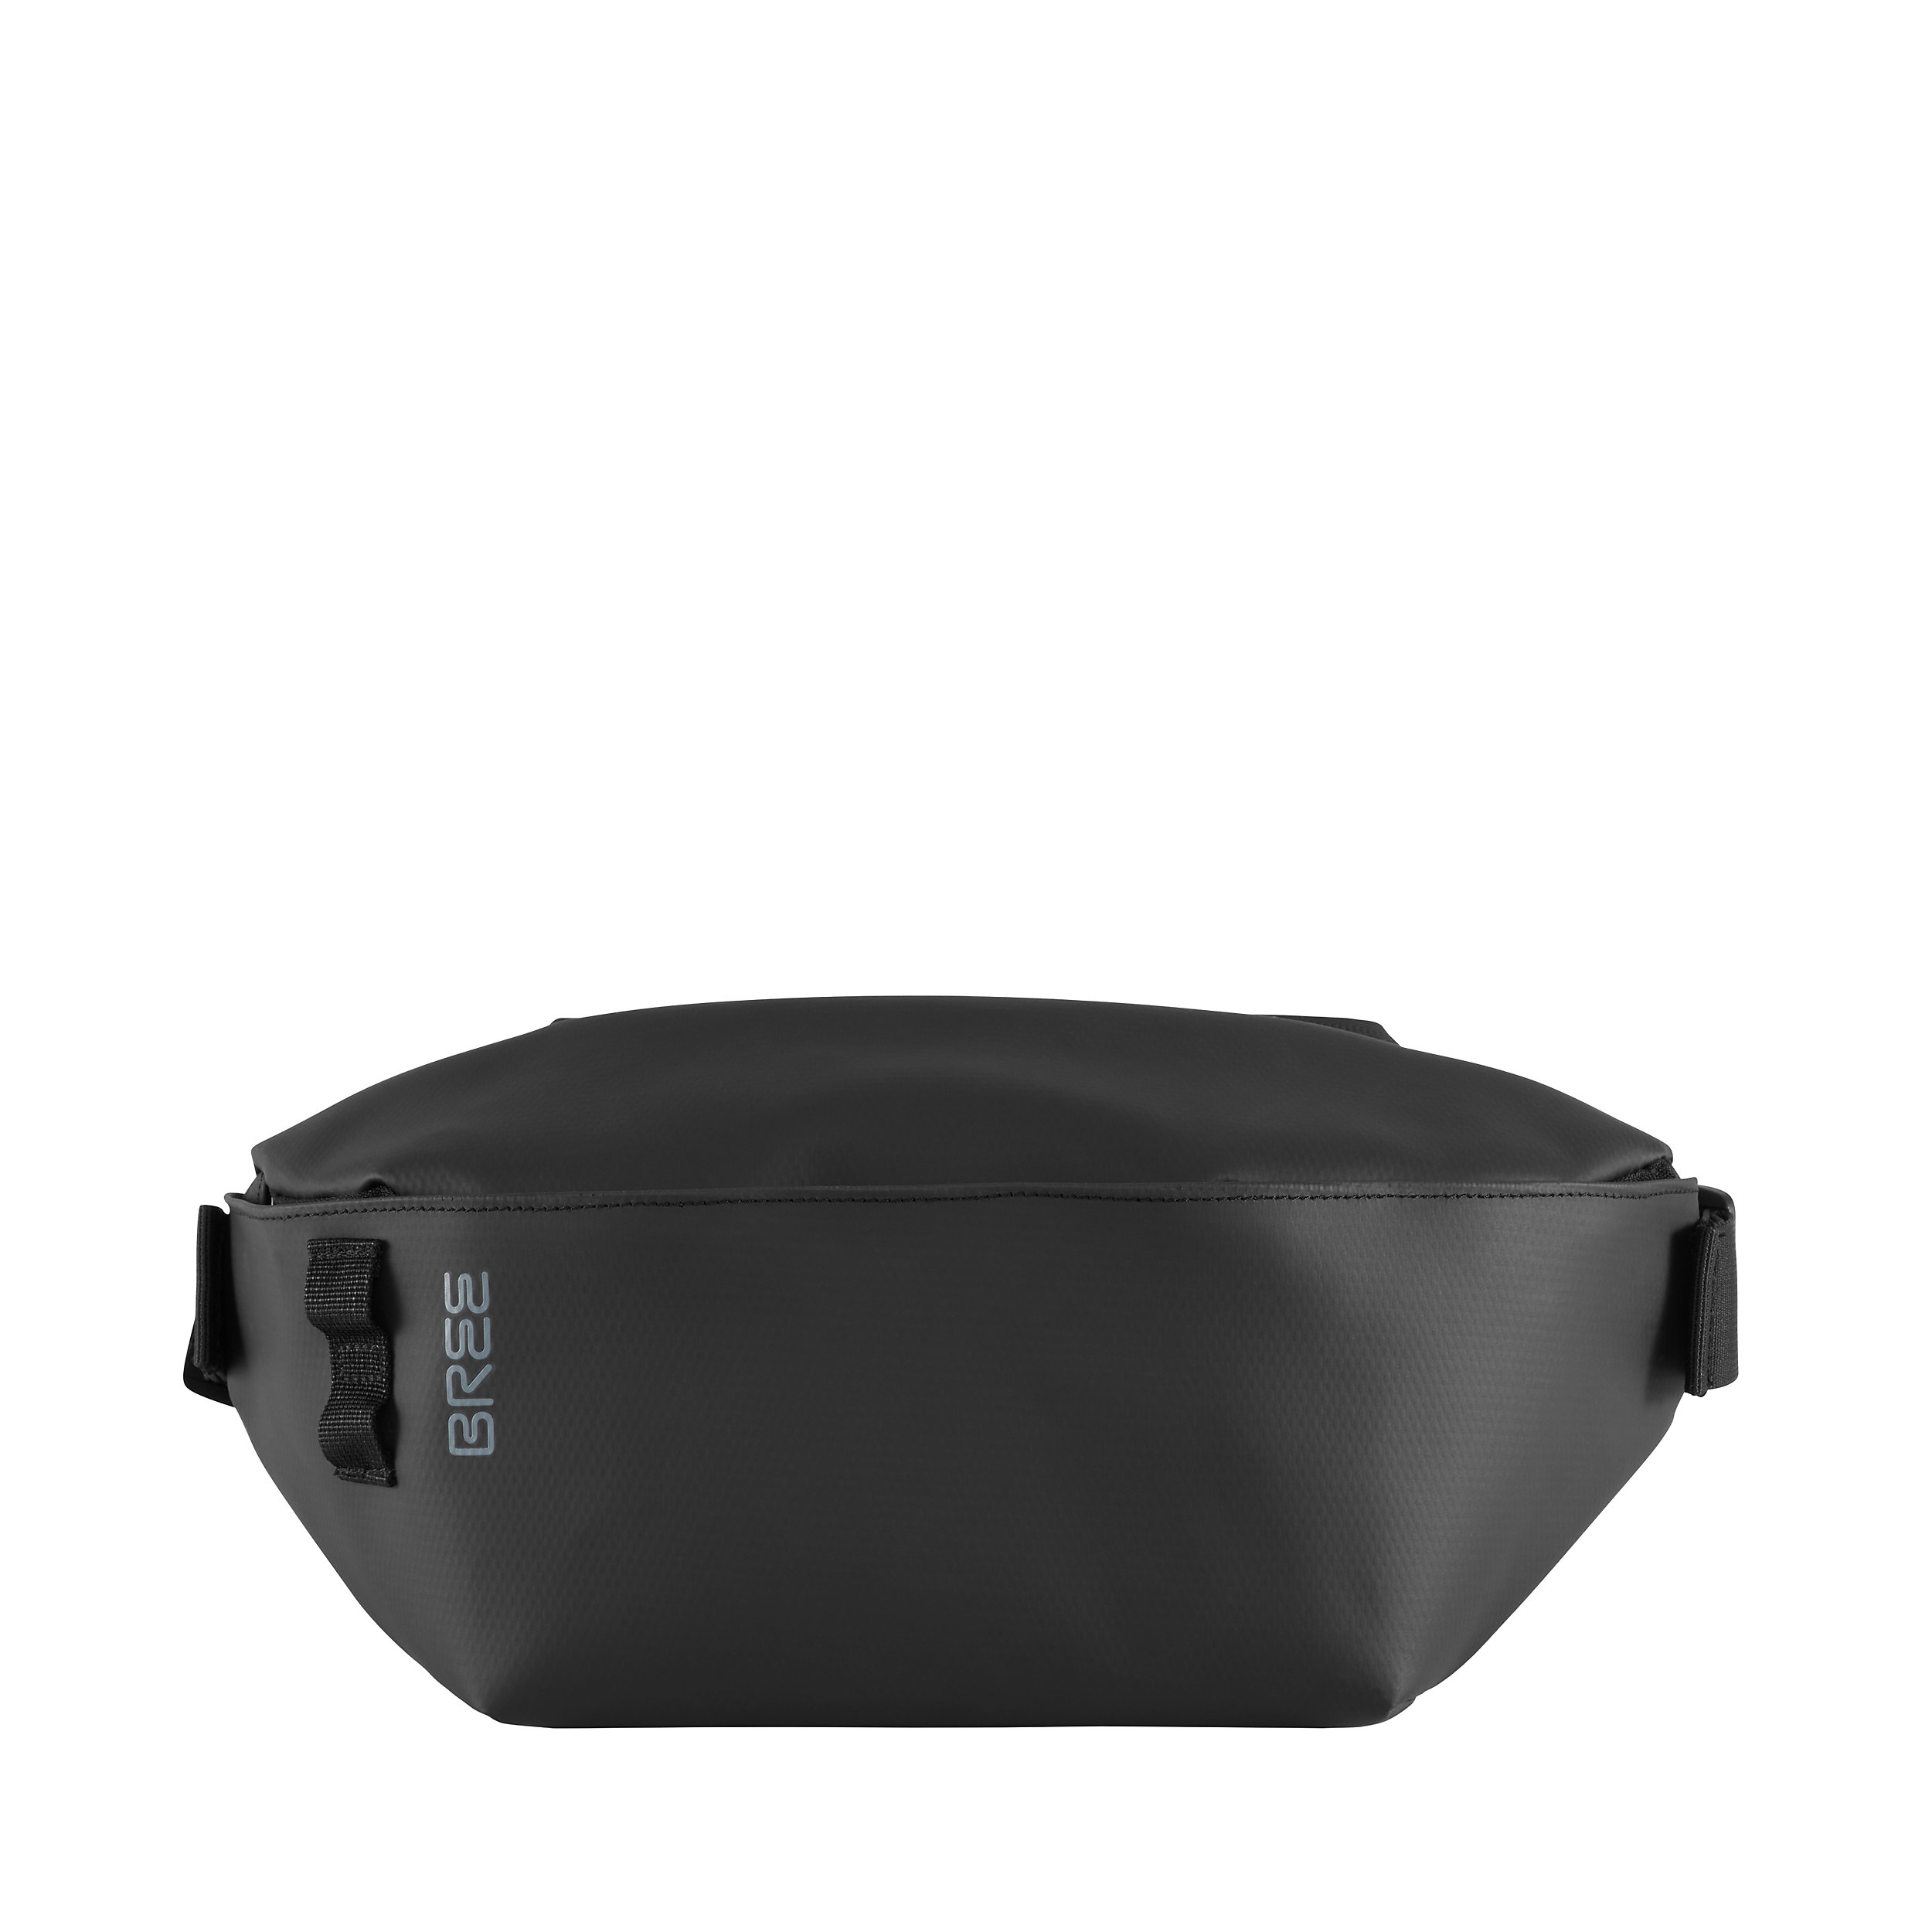 Bum Bag 728 Punch L 6 Liter